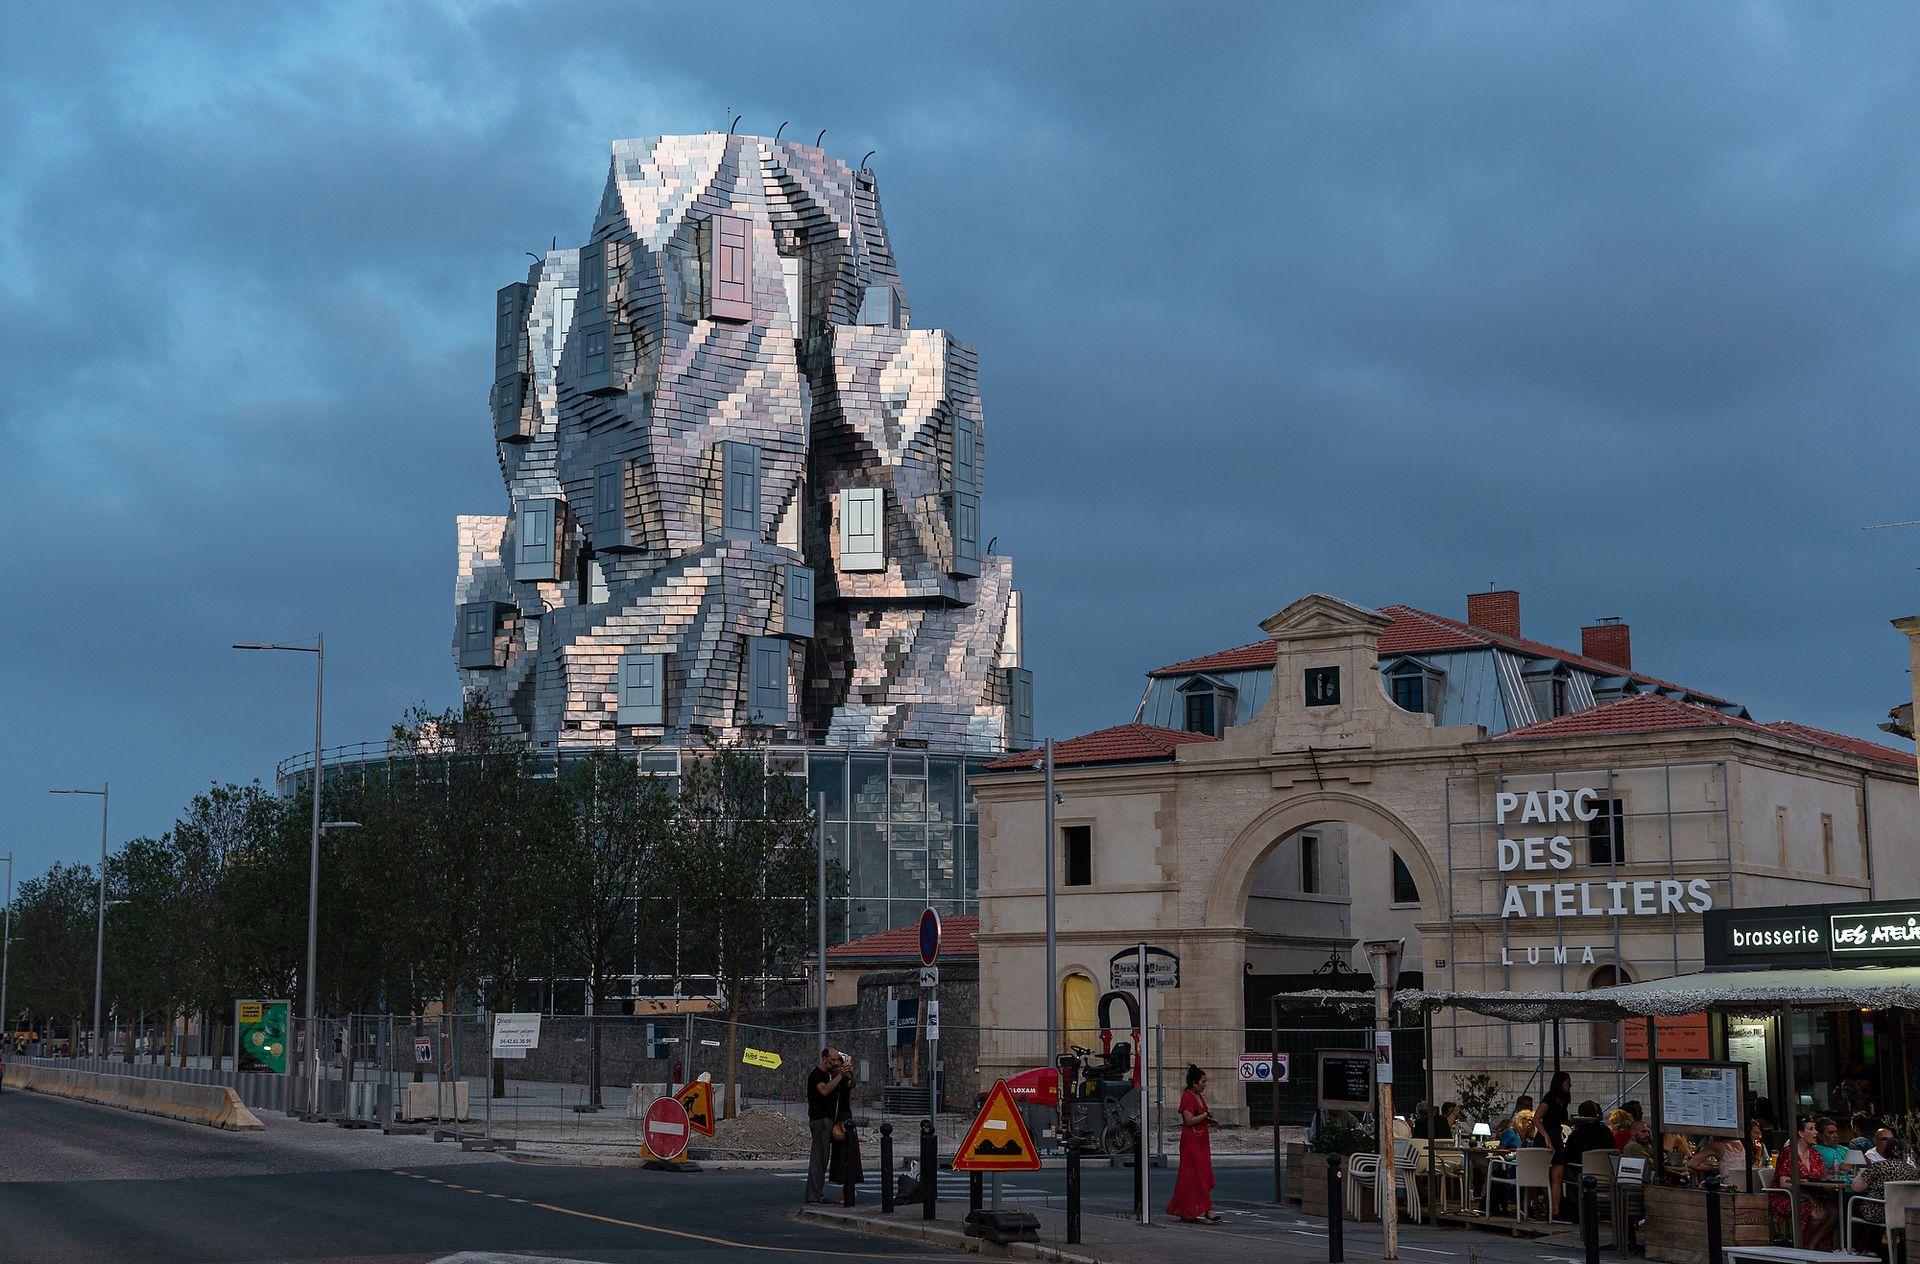 El edificio está destinado a ser un centro de creación artística